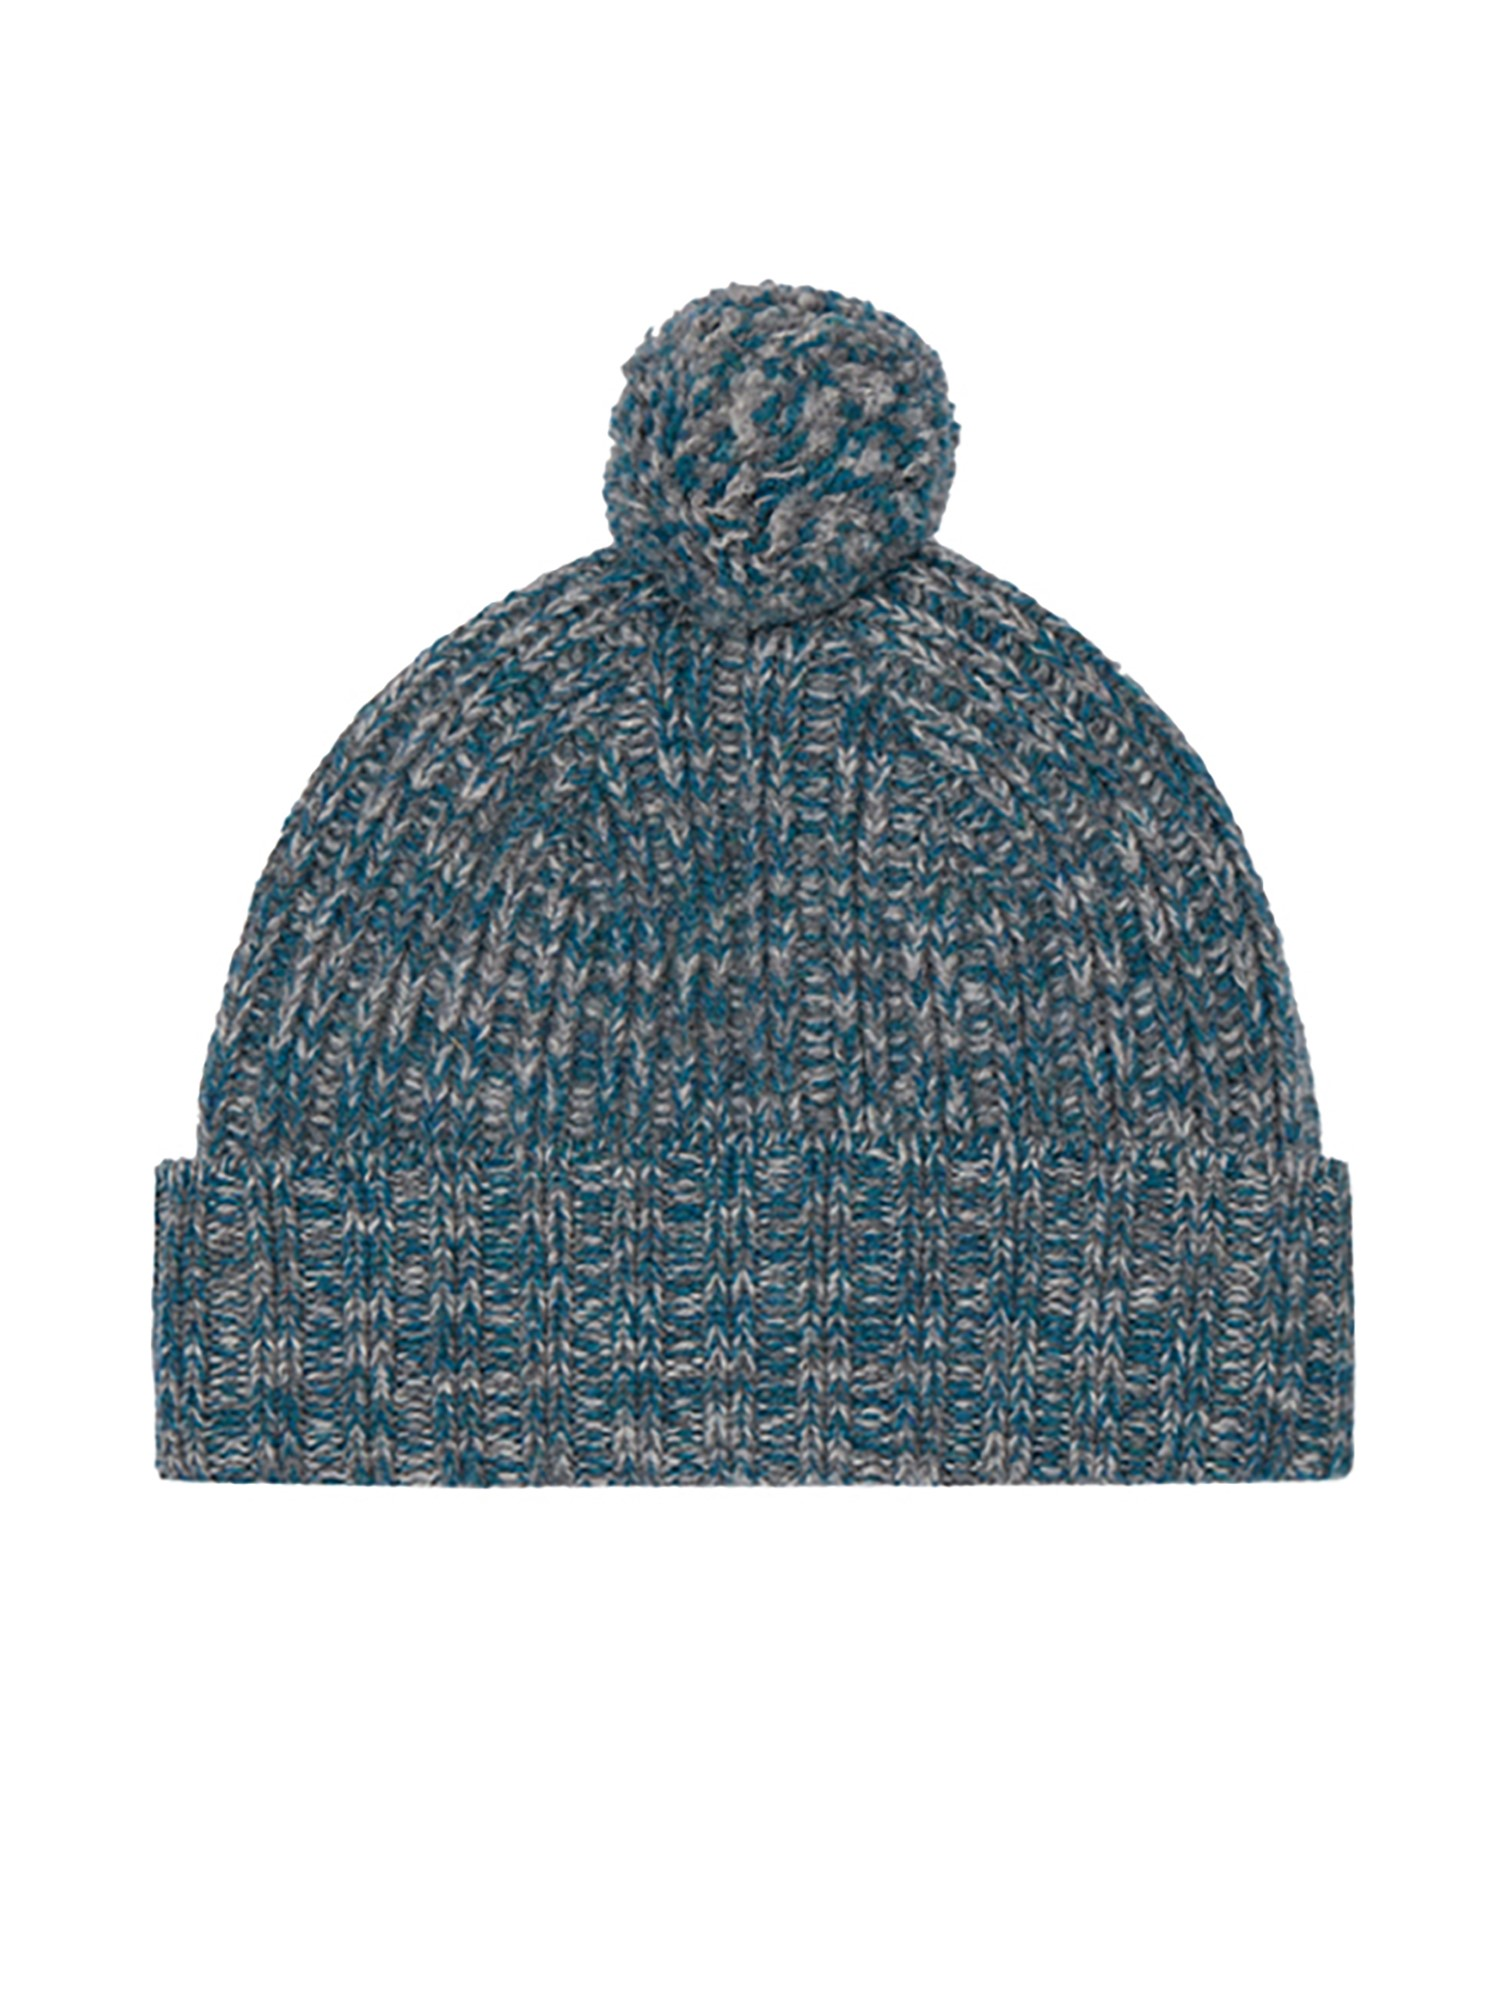 9f317091dcc0b Canna Hat Blue   Ben Sherman